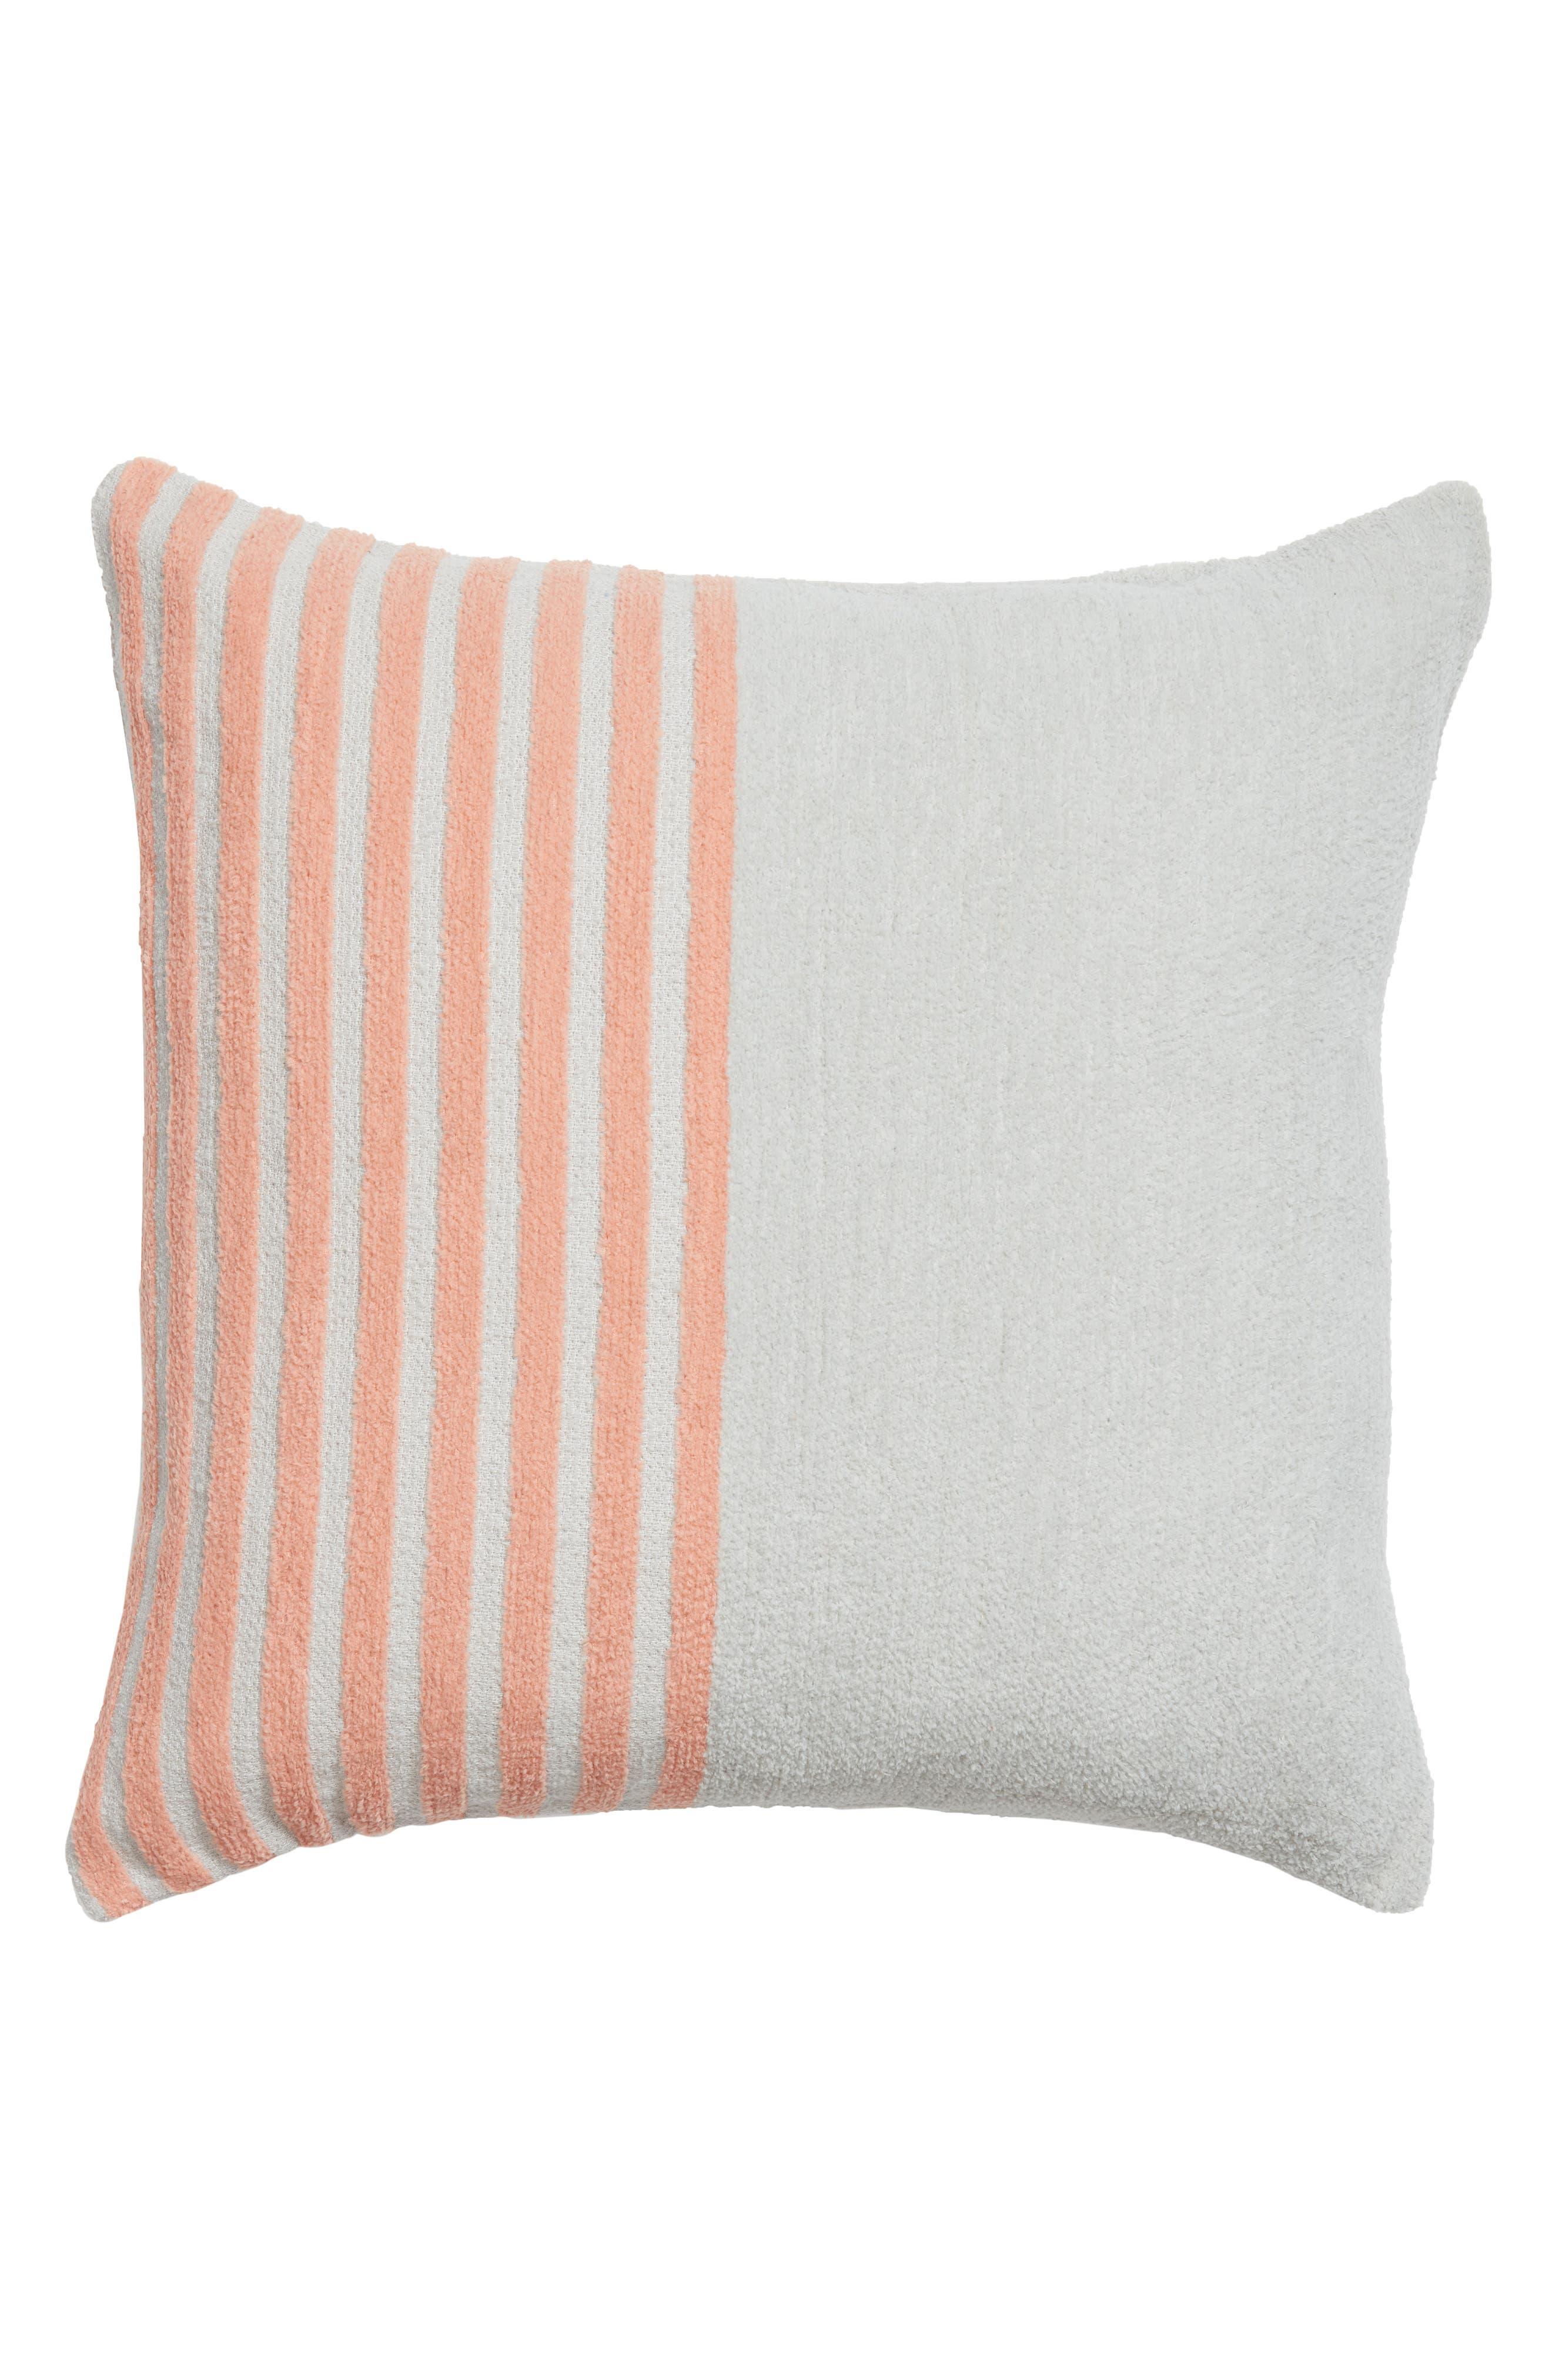 Hammam Stripe Accent Pillow,                         Main,                         color, Grey Vapor